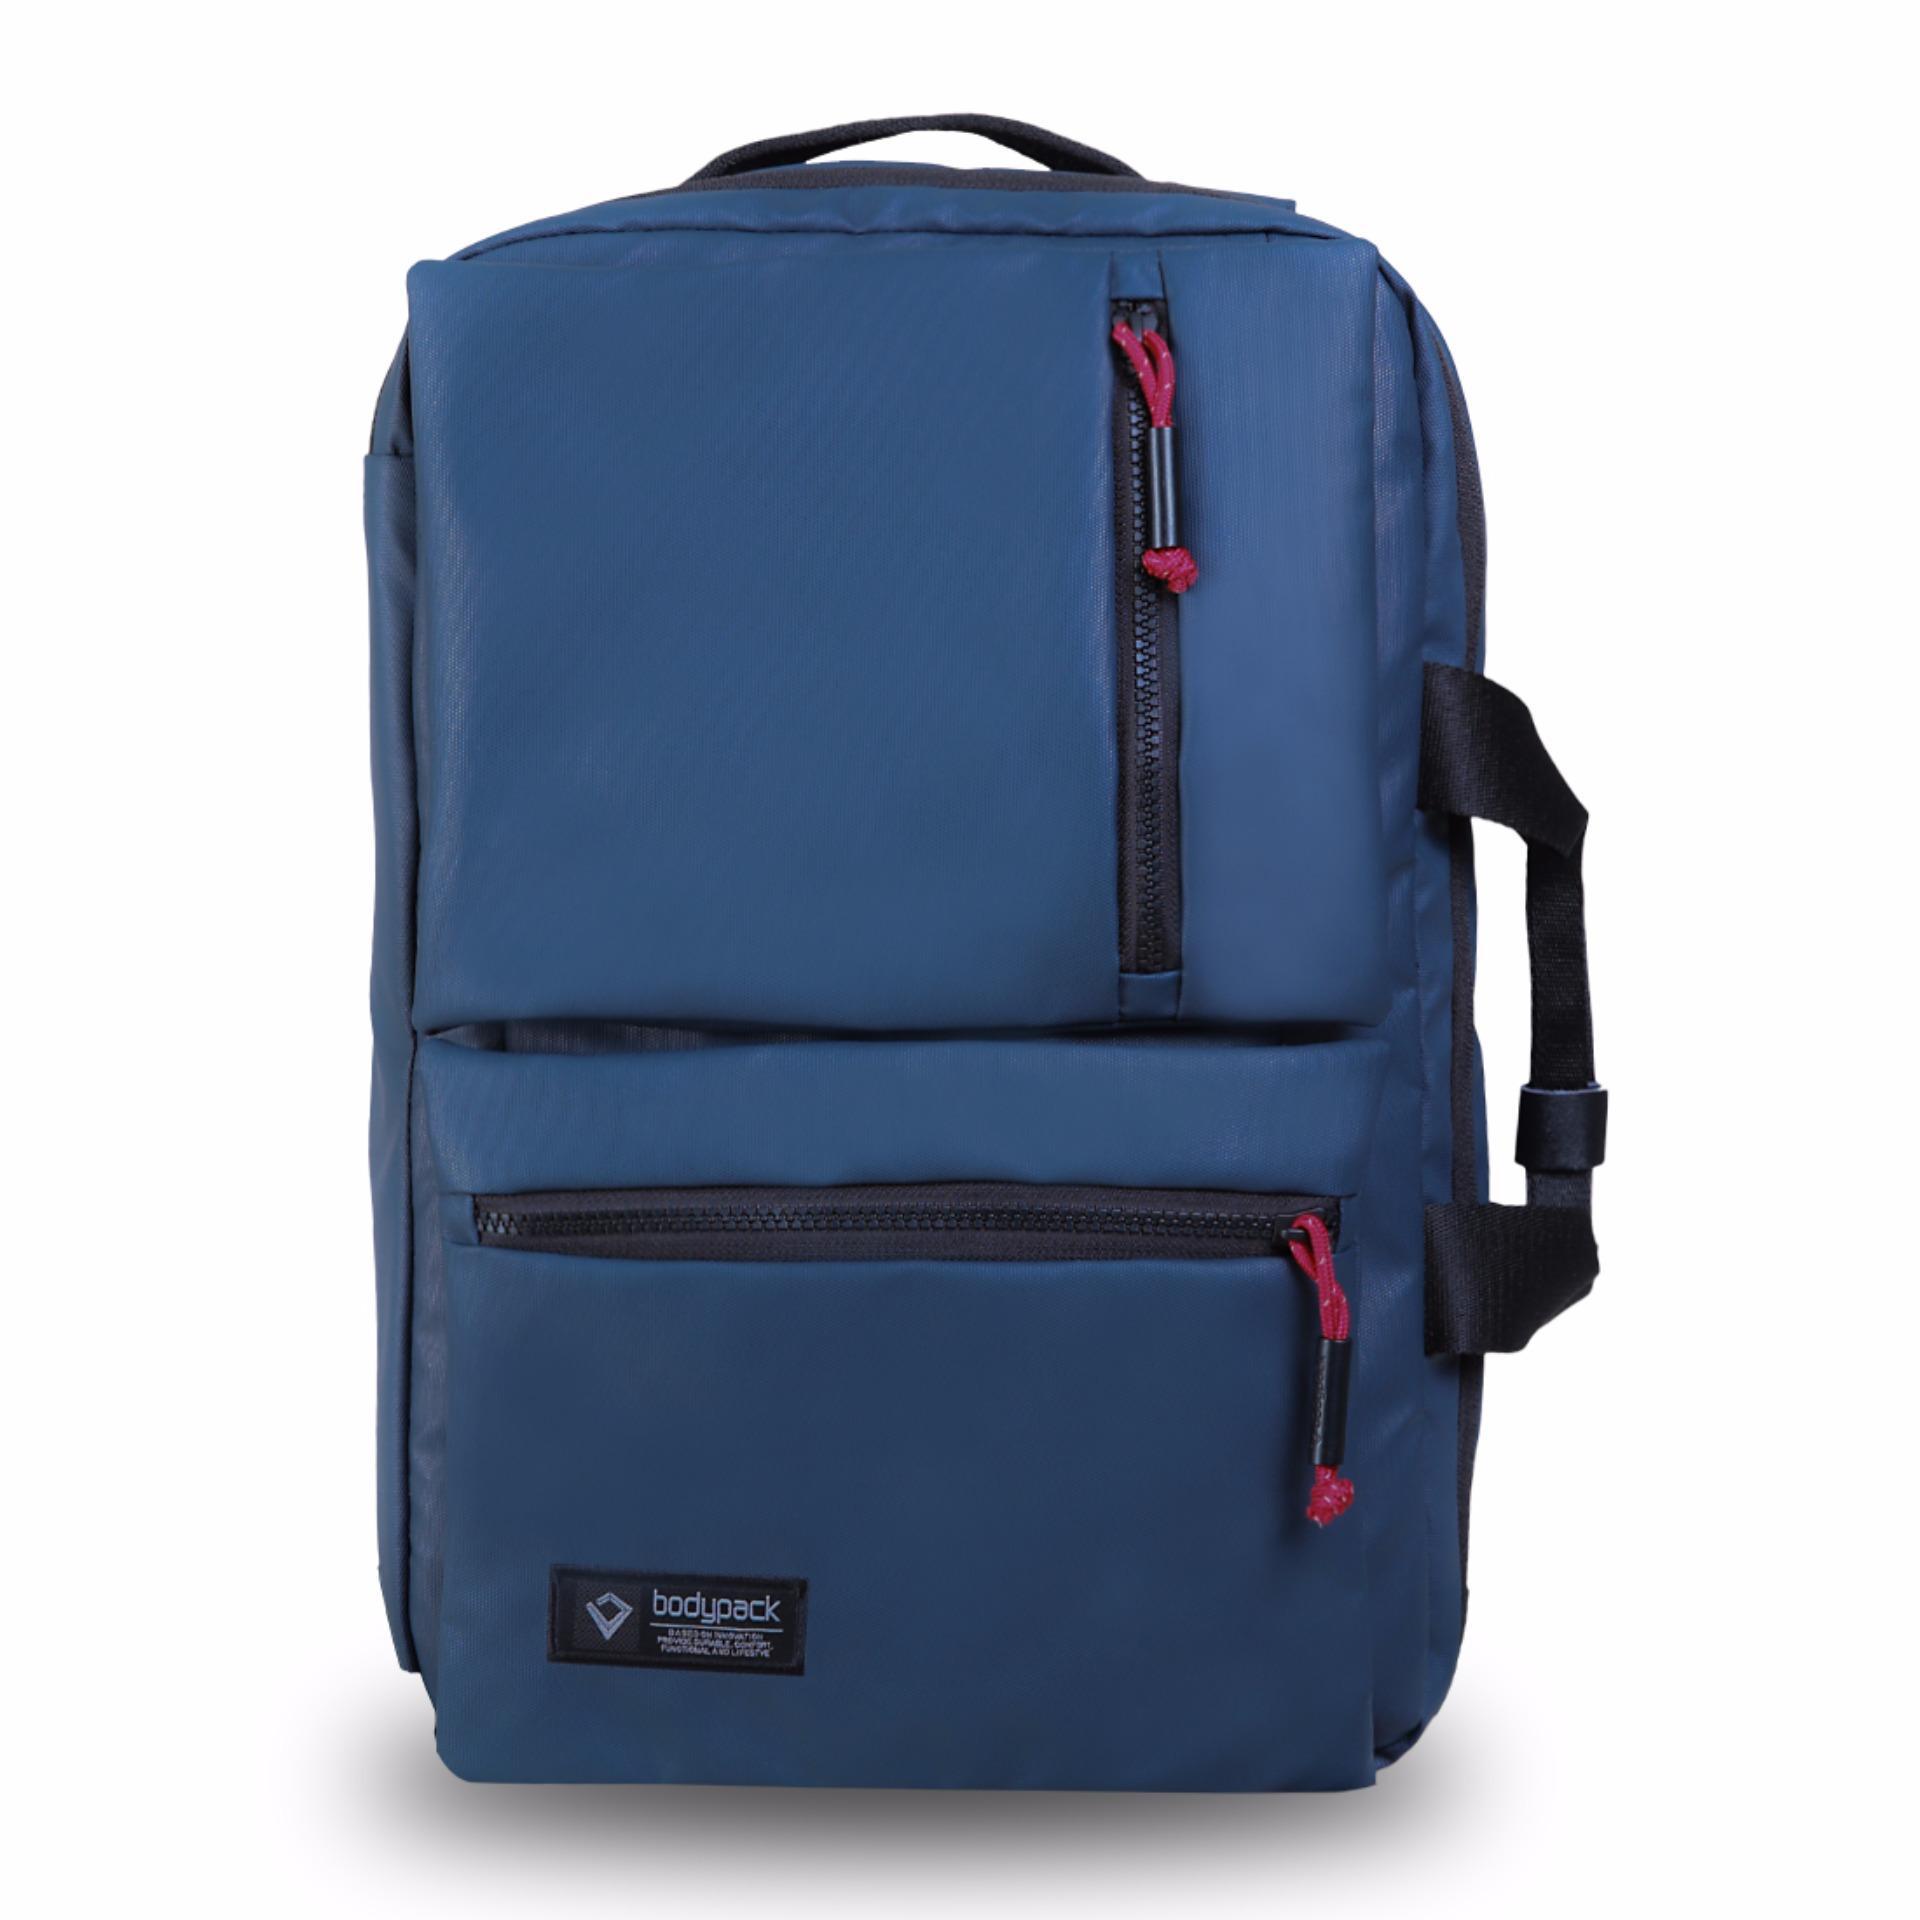 Review Bodypack Tas Laptop Trilogic Pria Purposive Biru Di Indonesia